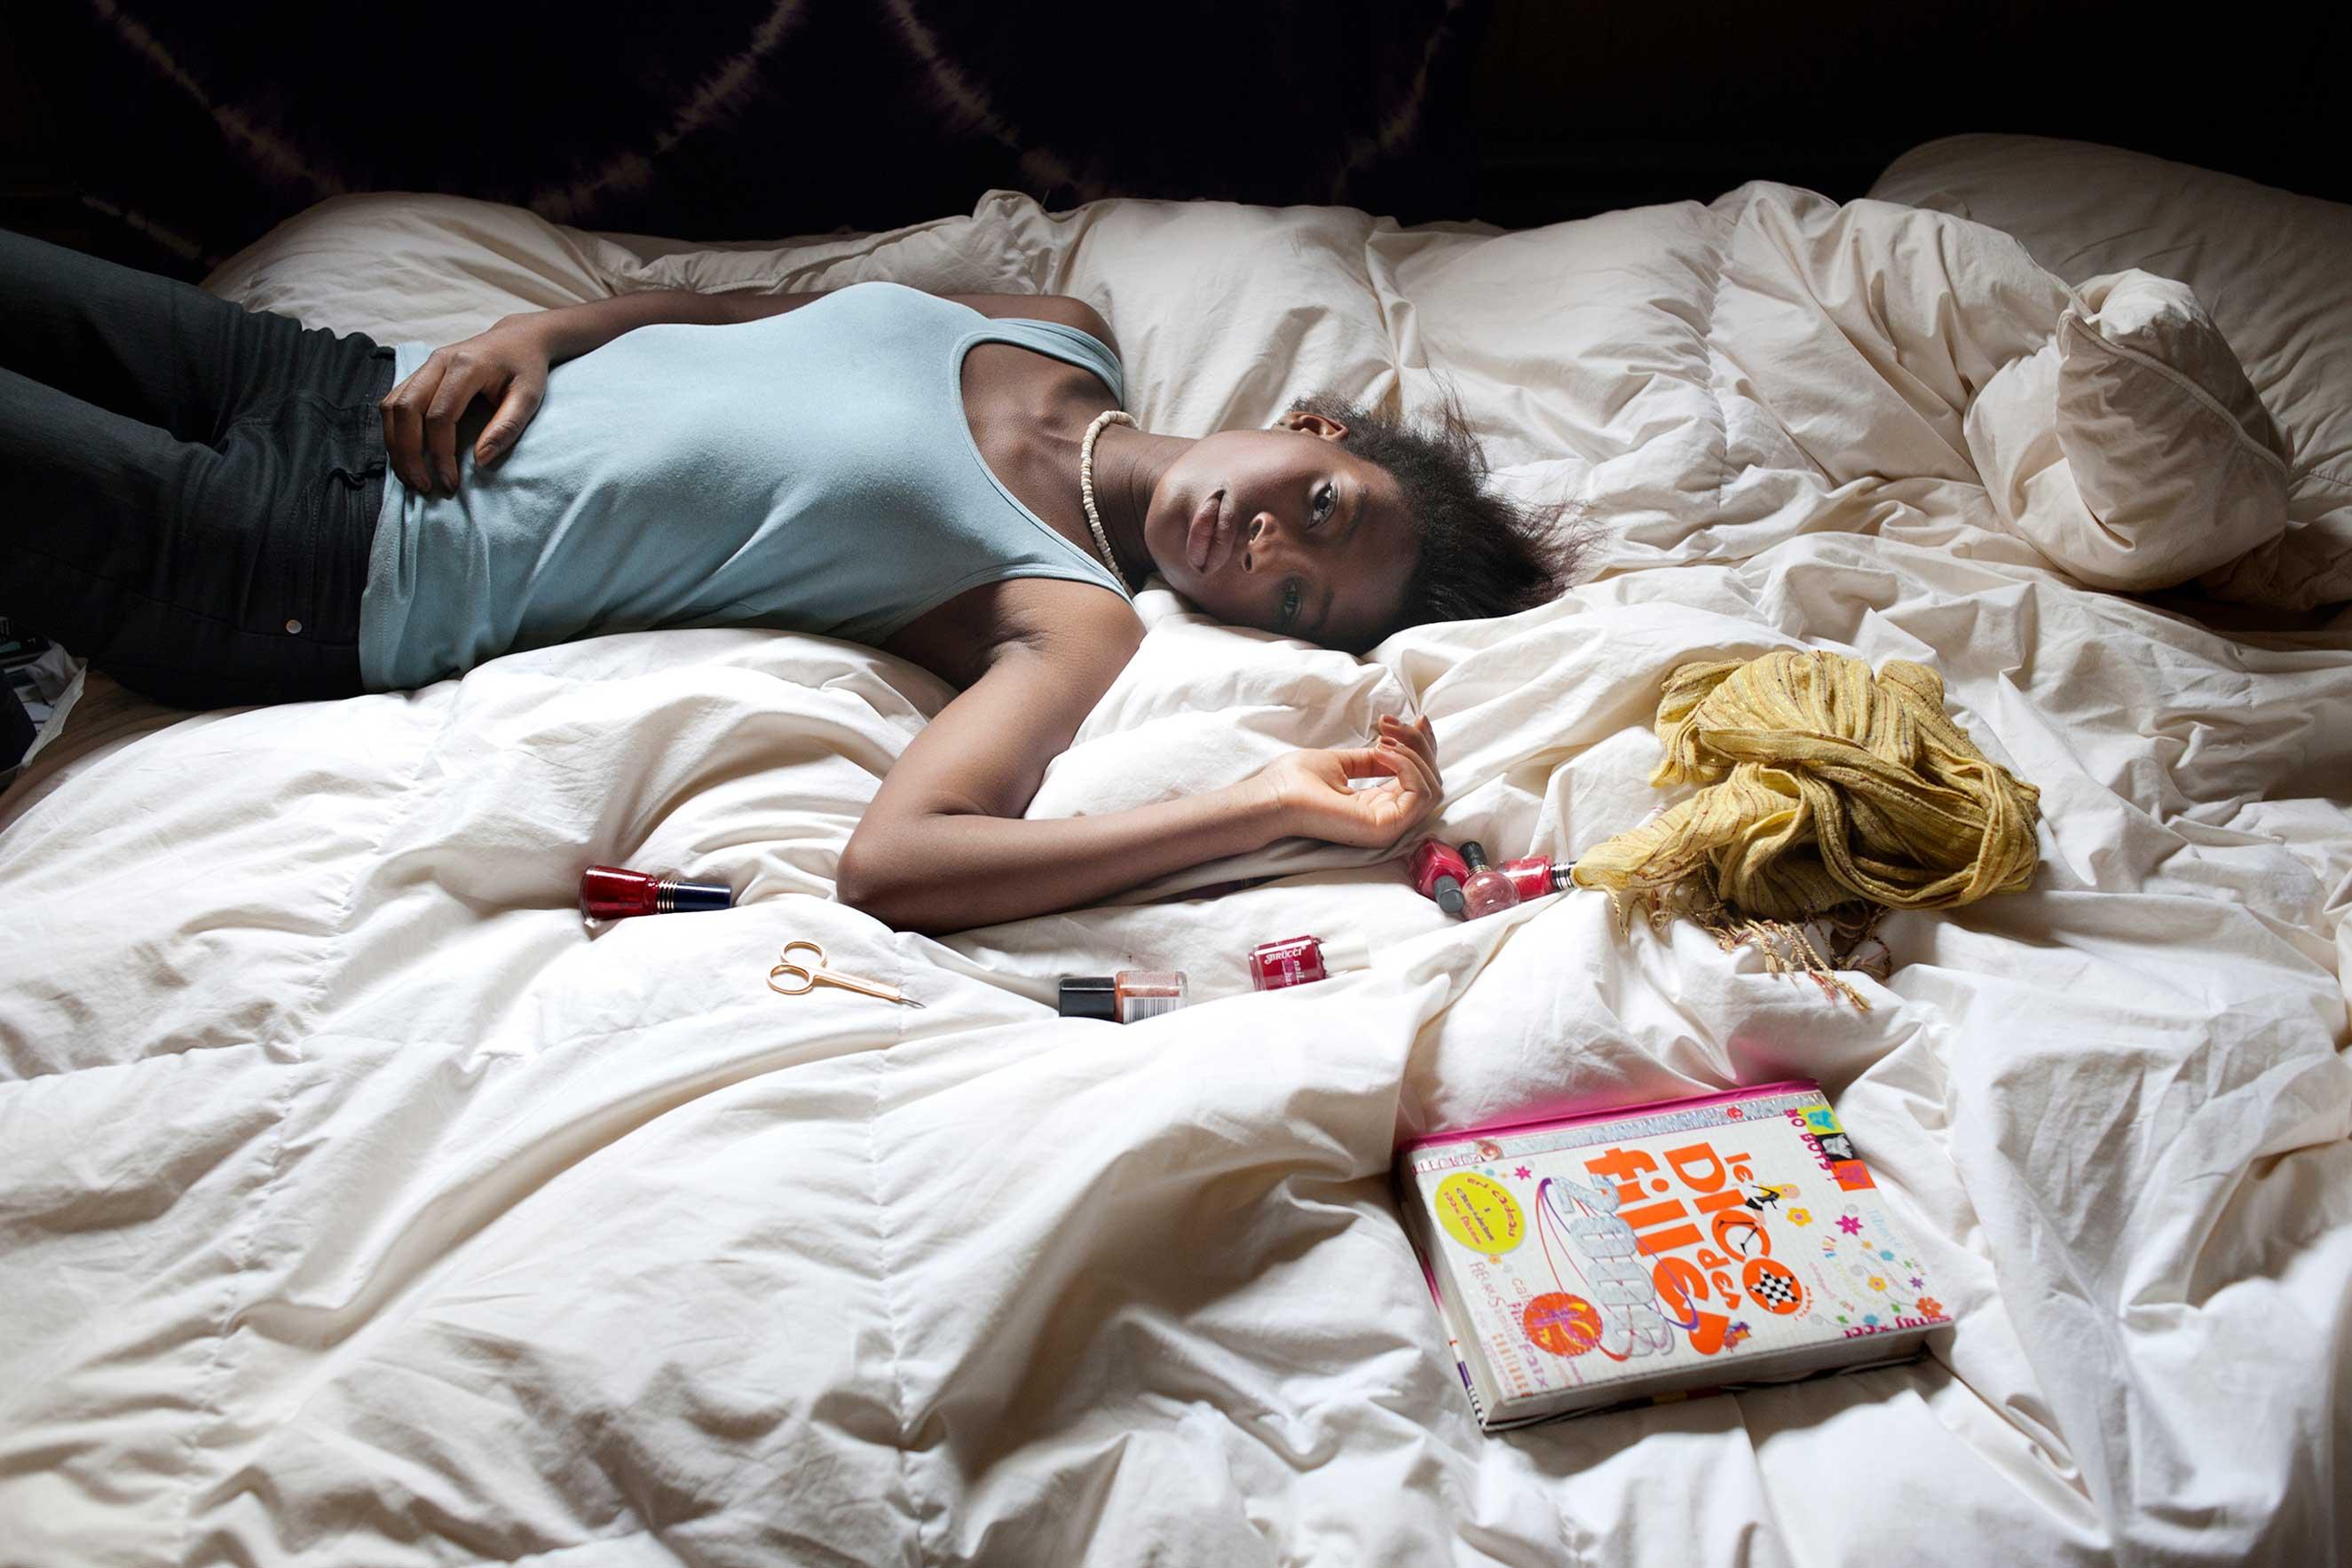 'Raissa, Medford, Massachusetts, 2009' in the series, A Girl and Her Room.